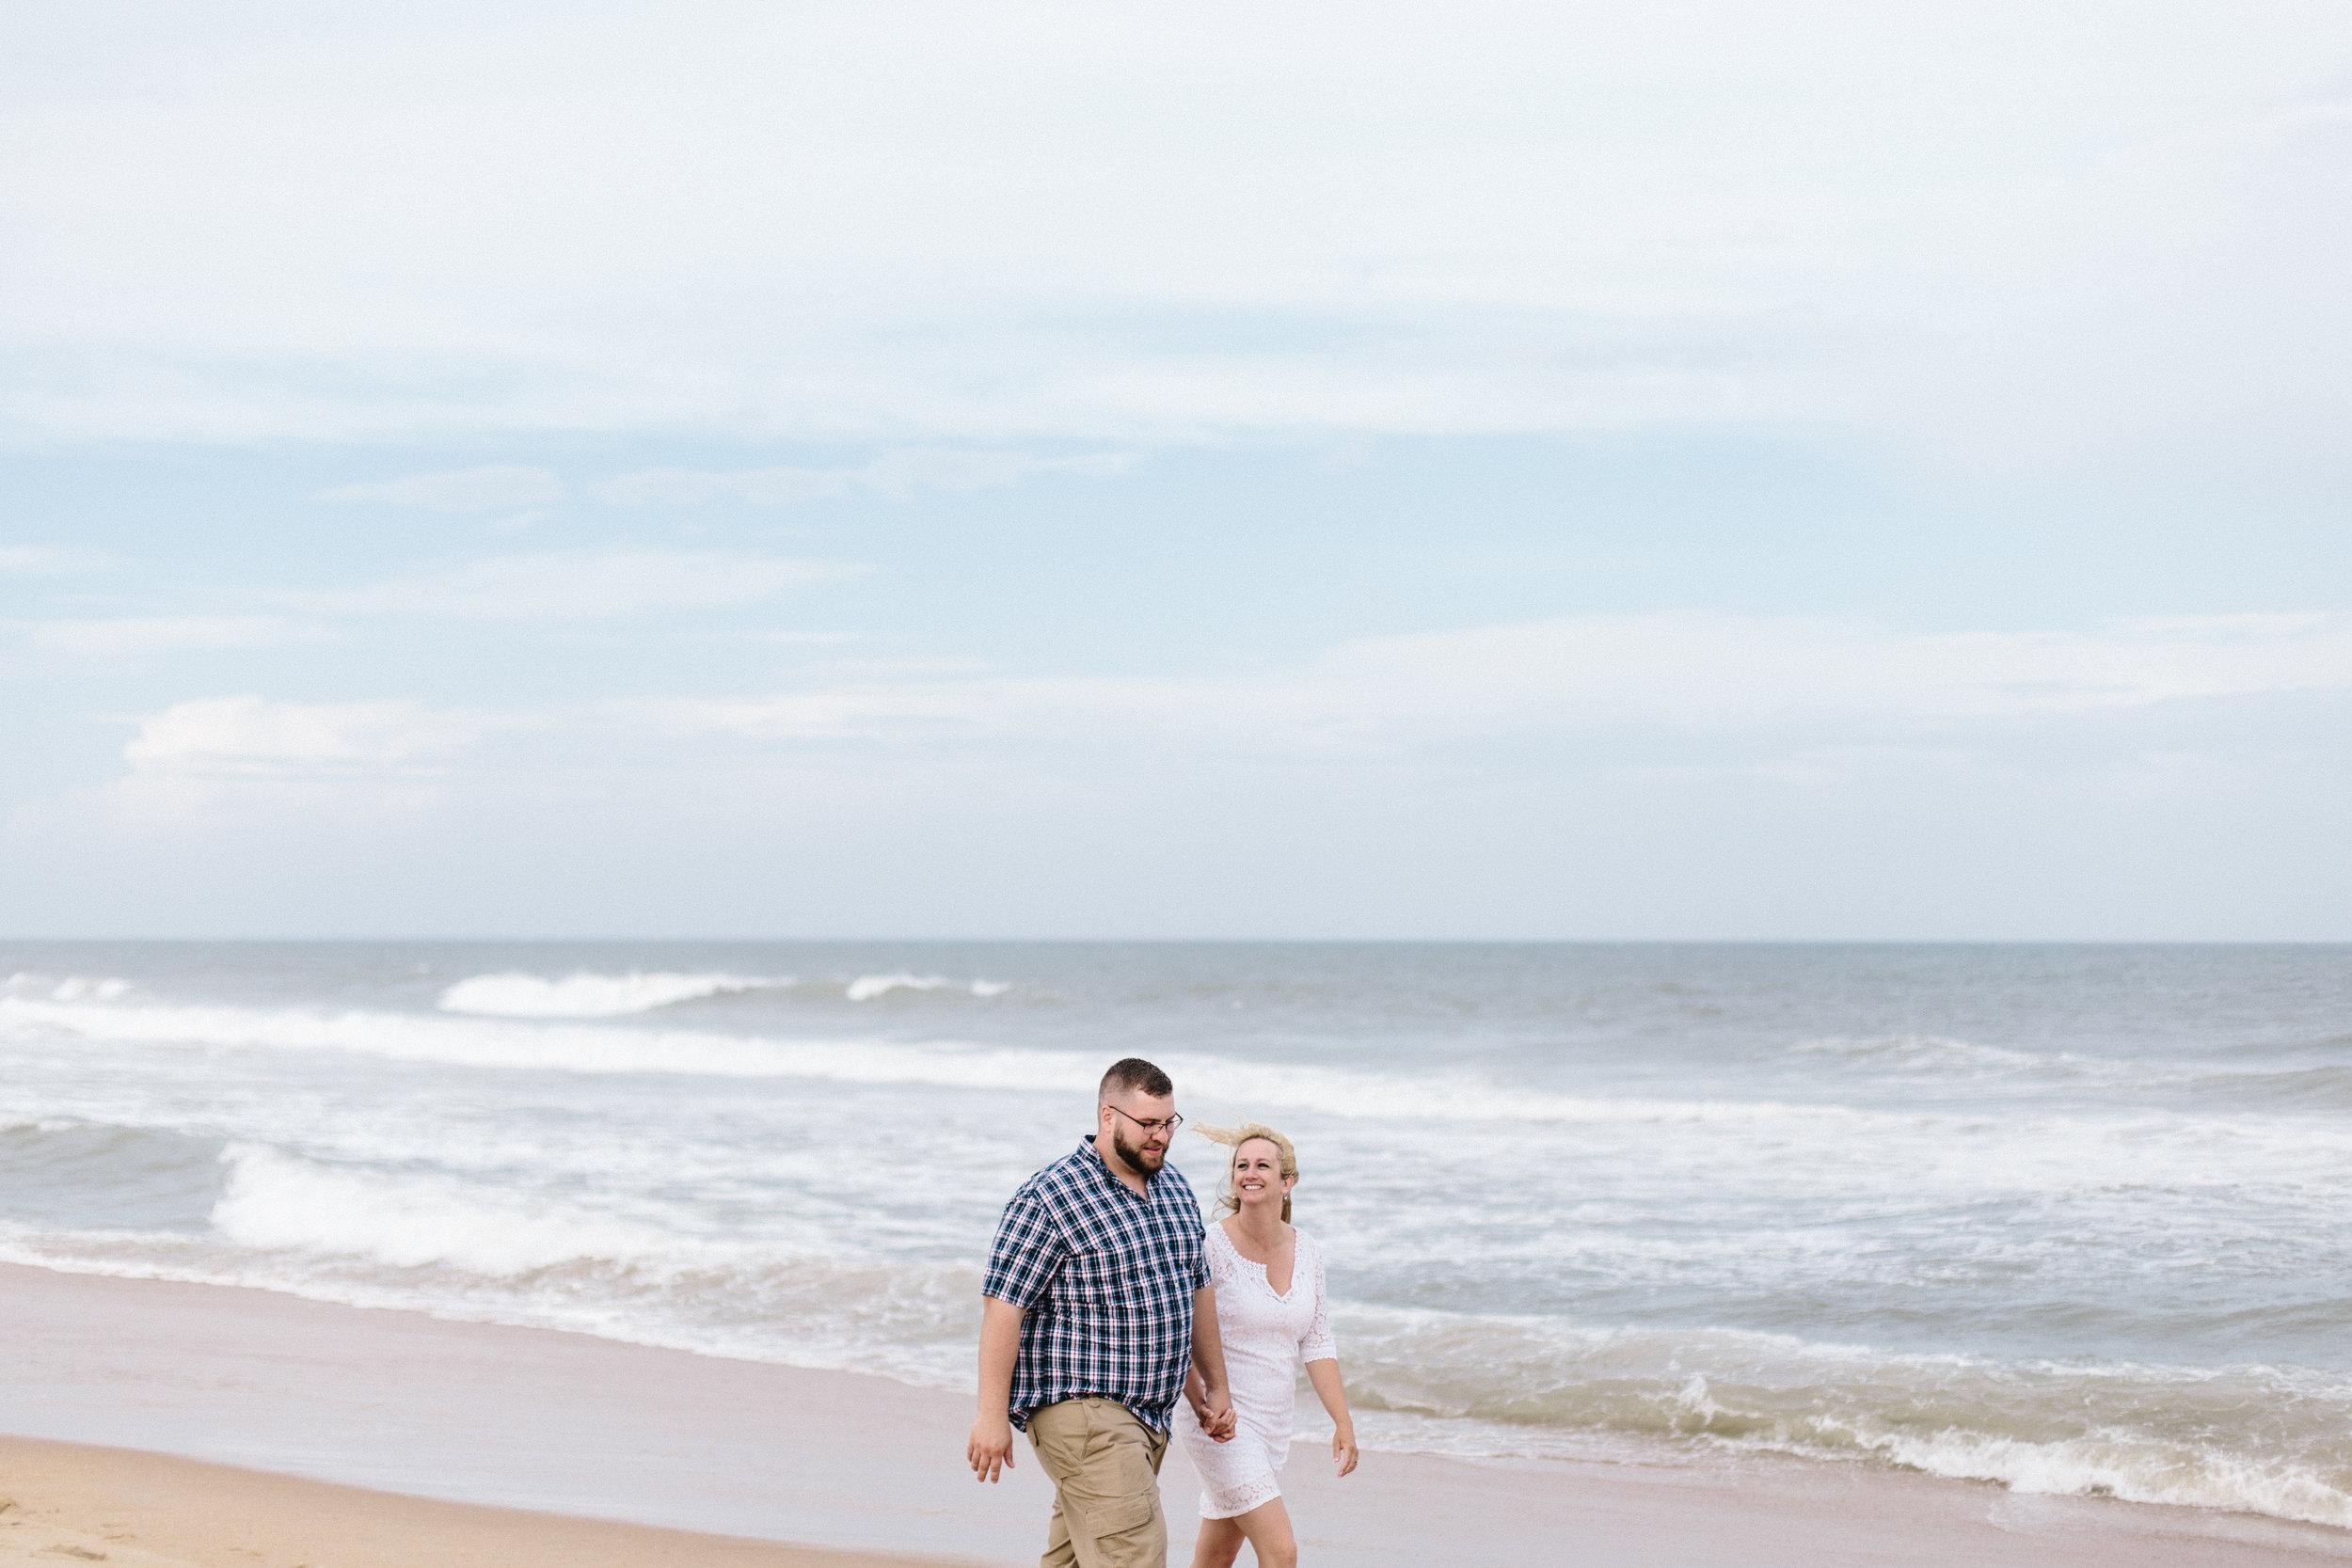 alyssa barletter photography destination wedding travel elopement obx north carolina beach-1.jpg